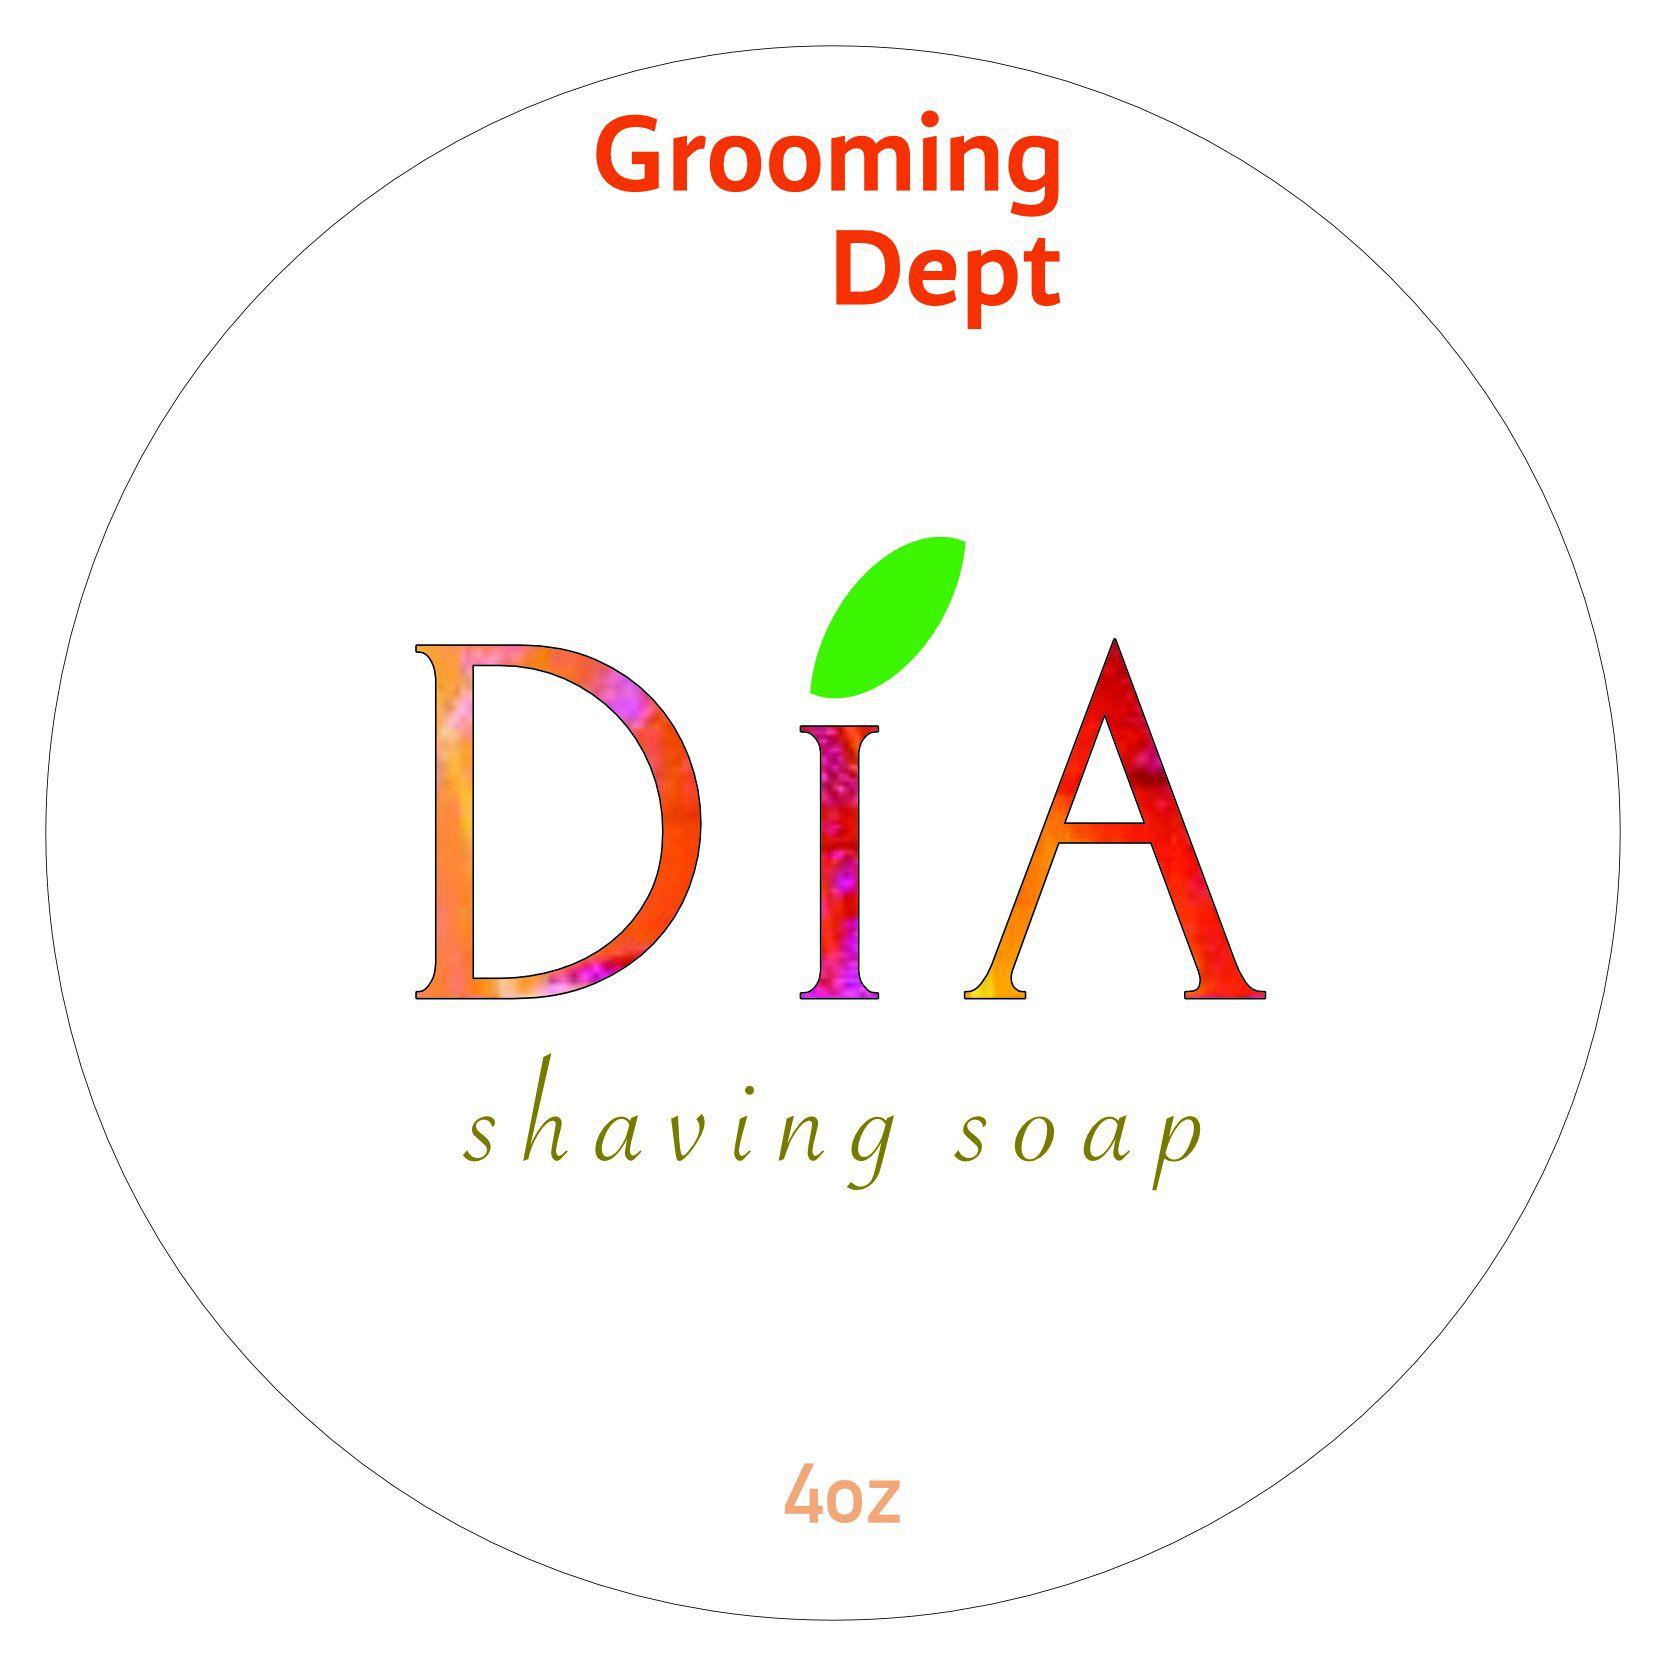 Grooming Dept - DiA - Soap image